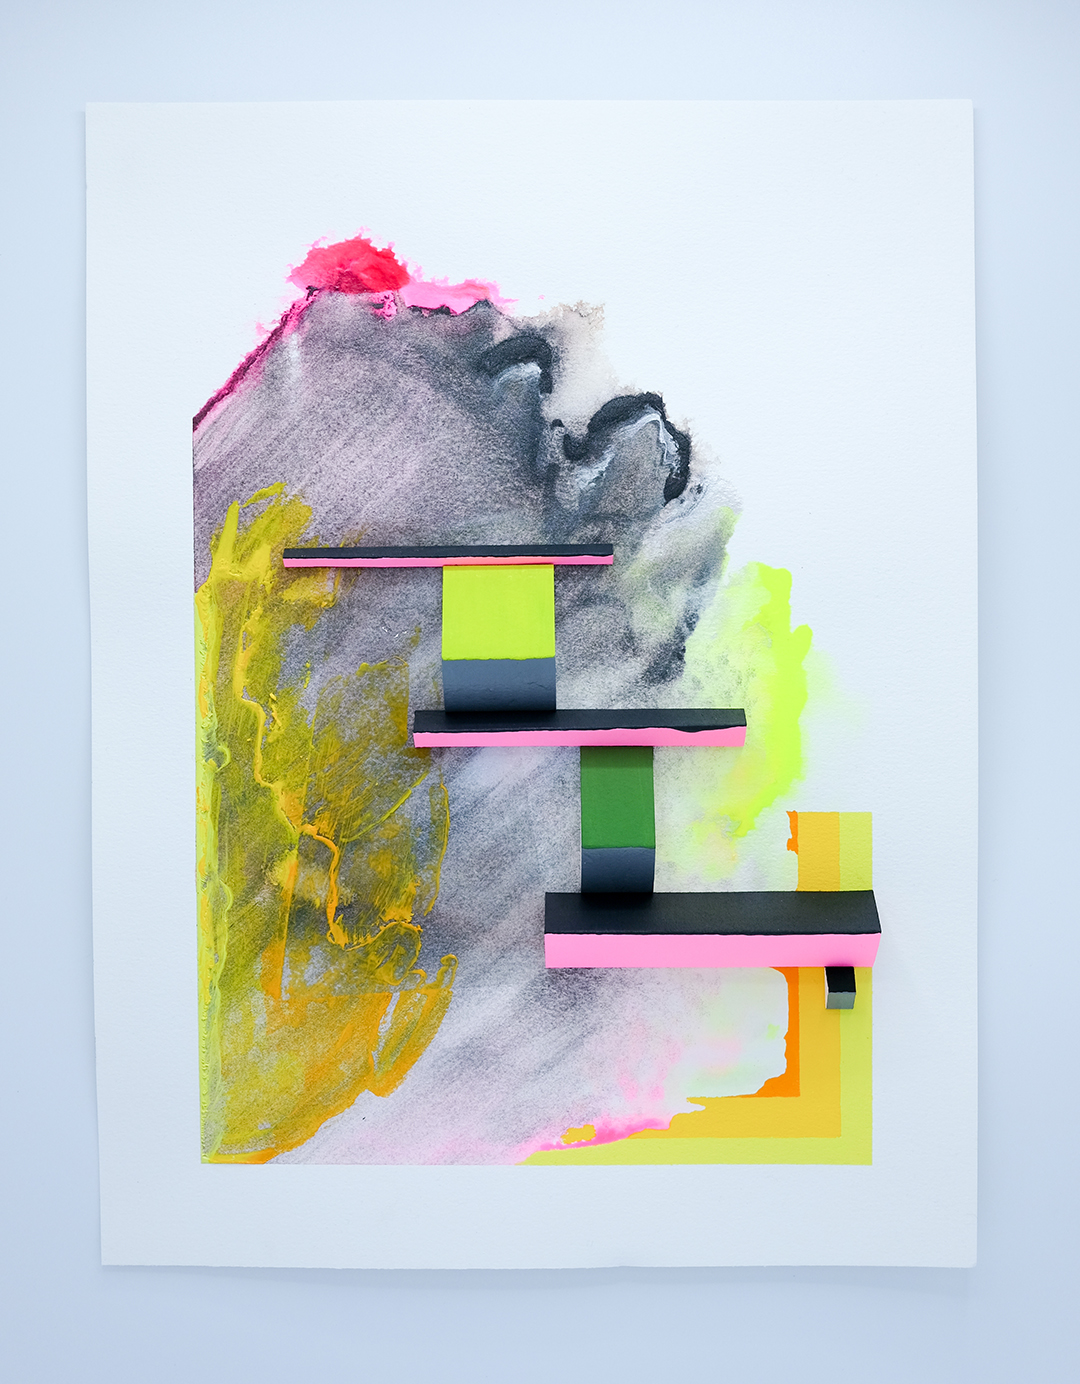 "The Bridge , paper constructions, acrylic on paper, 16"" x 12"" 2018"